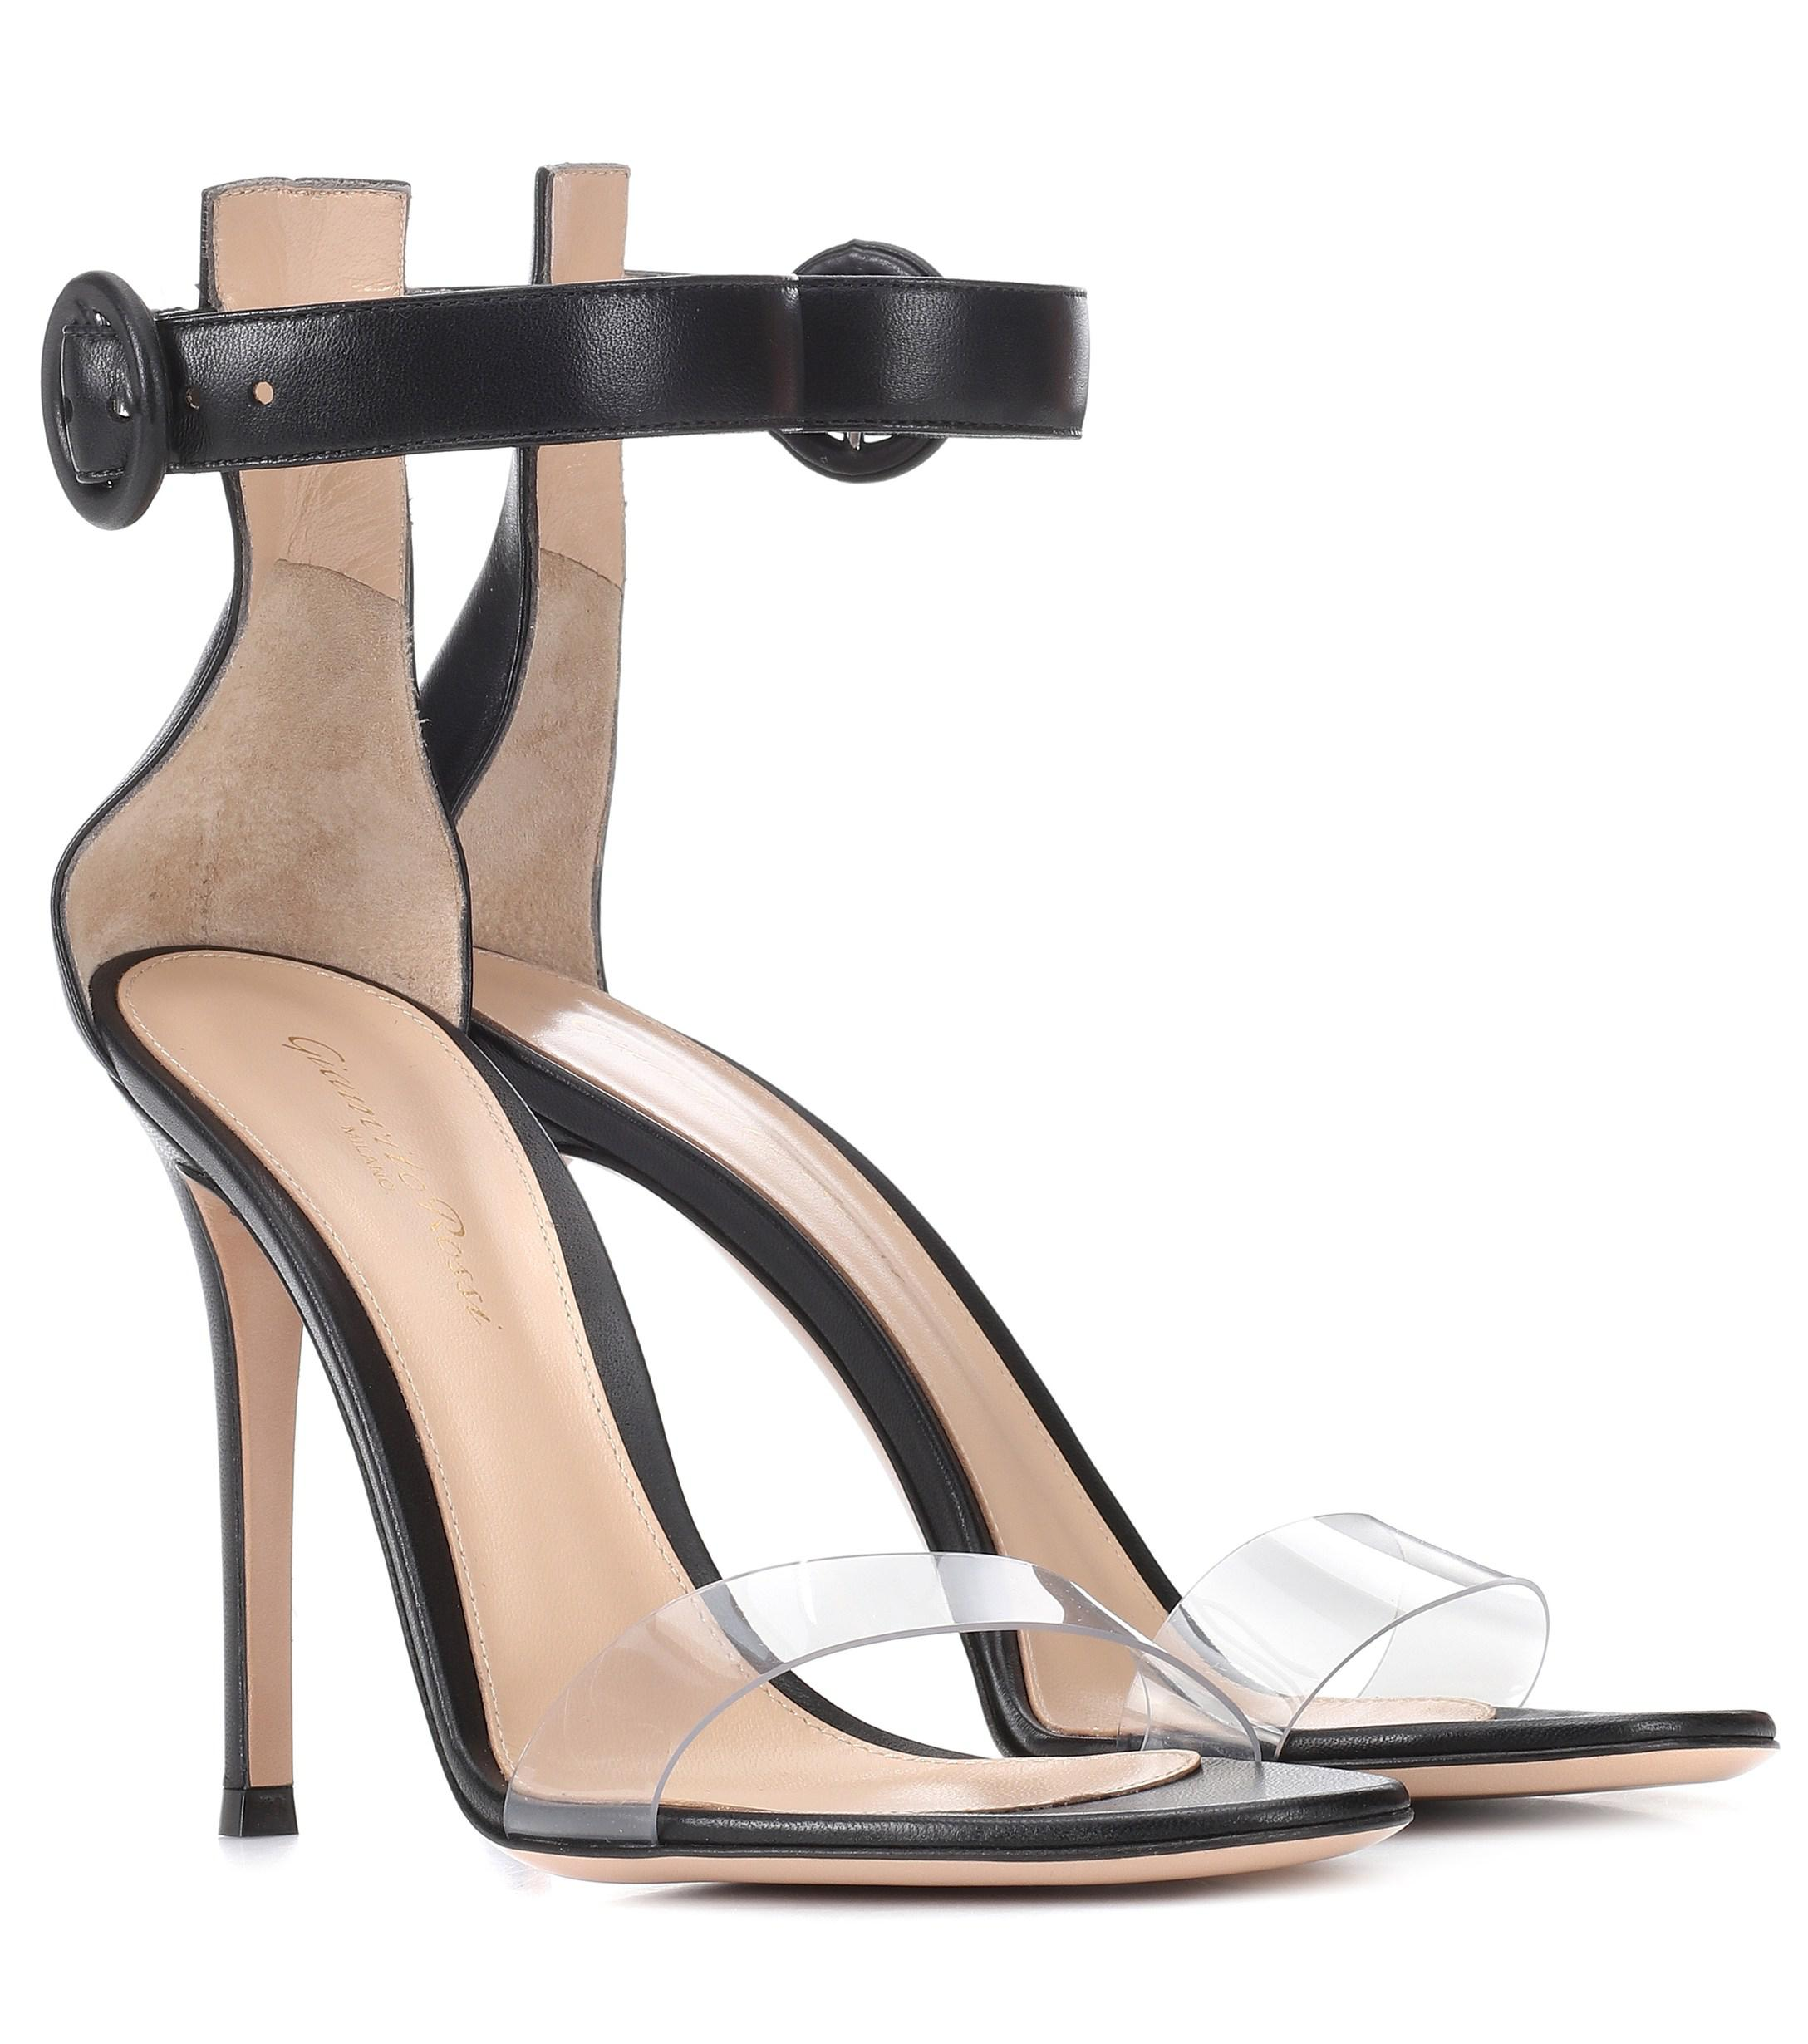 2caef1738b4 Gianvito Rossi Stella Leather Sandals in Black - Lyst